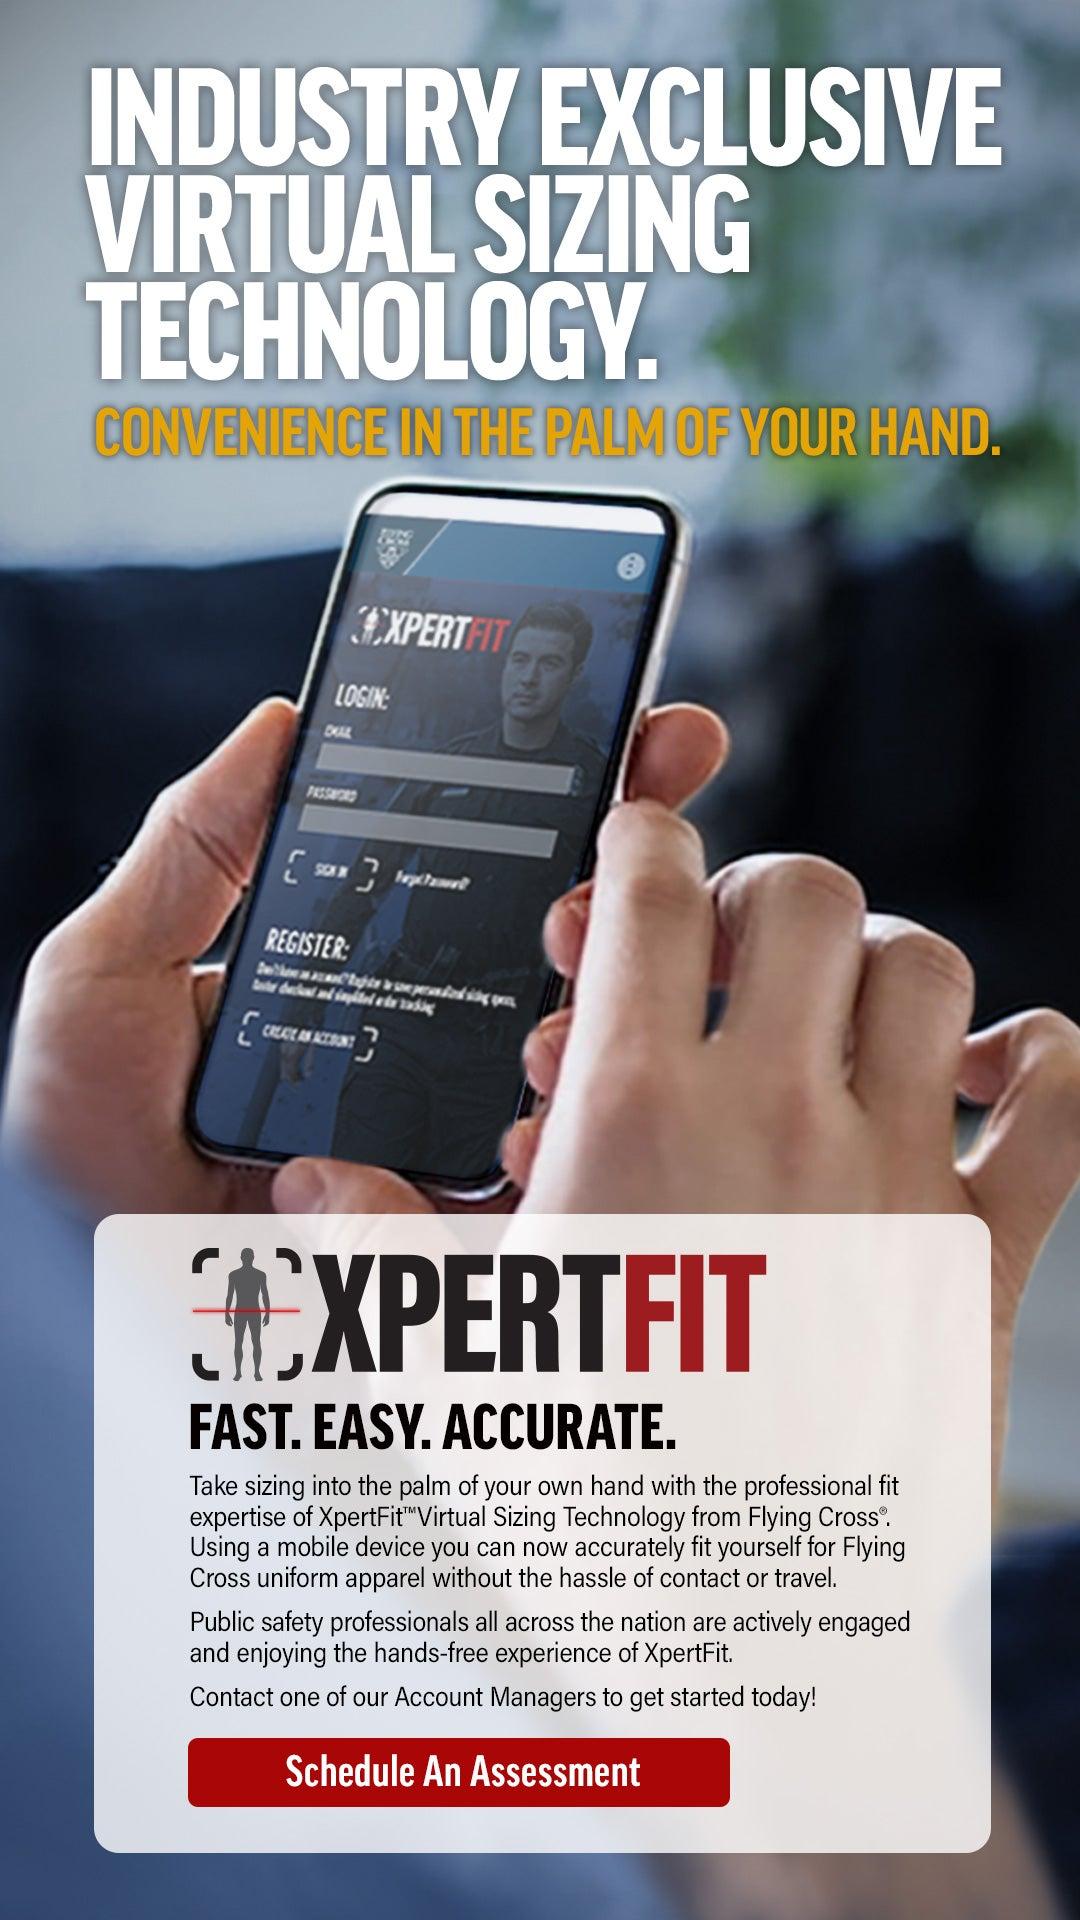 Xpertfit